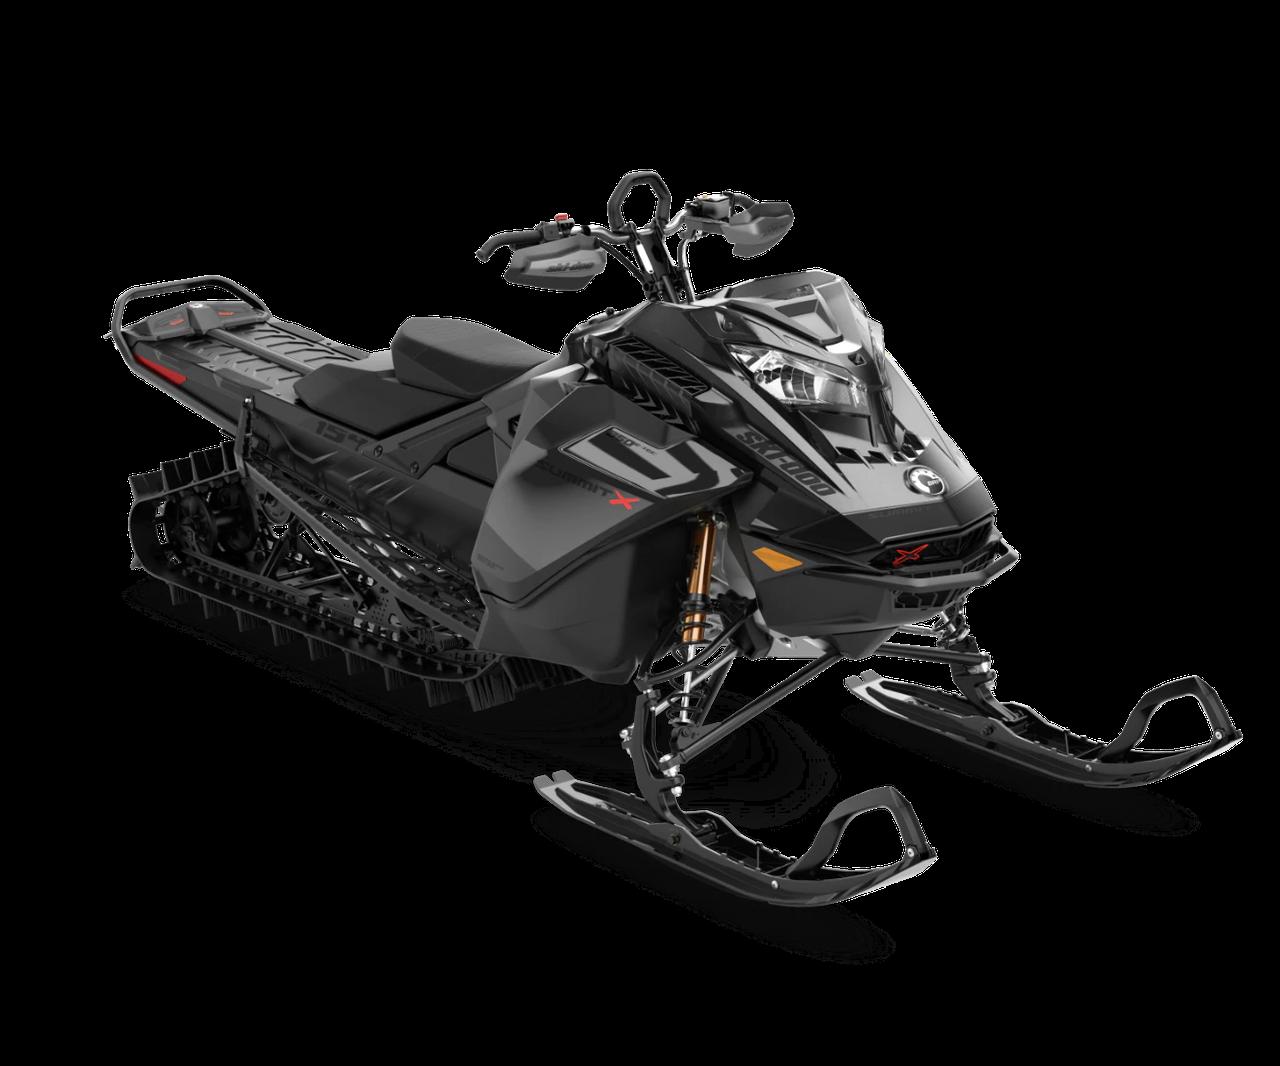 Снегоход Summit X Expert 154'' SHOT 850 E-TEC Turbo Черный металлик 2021